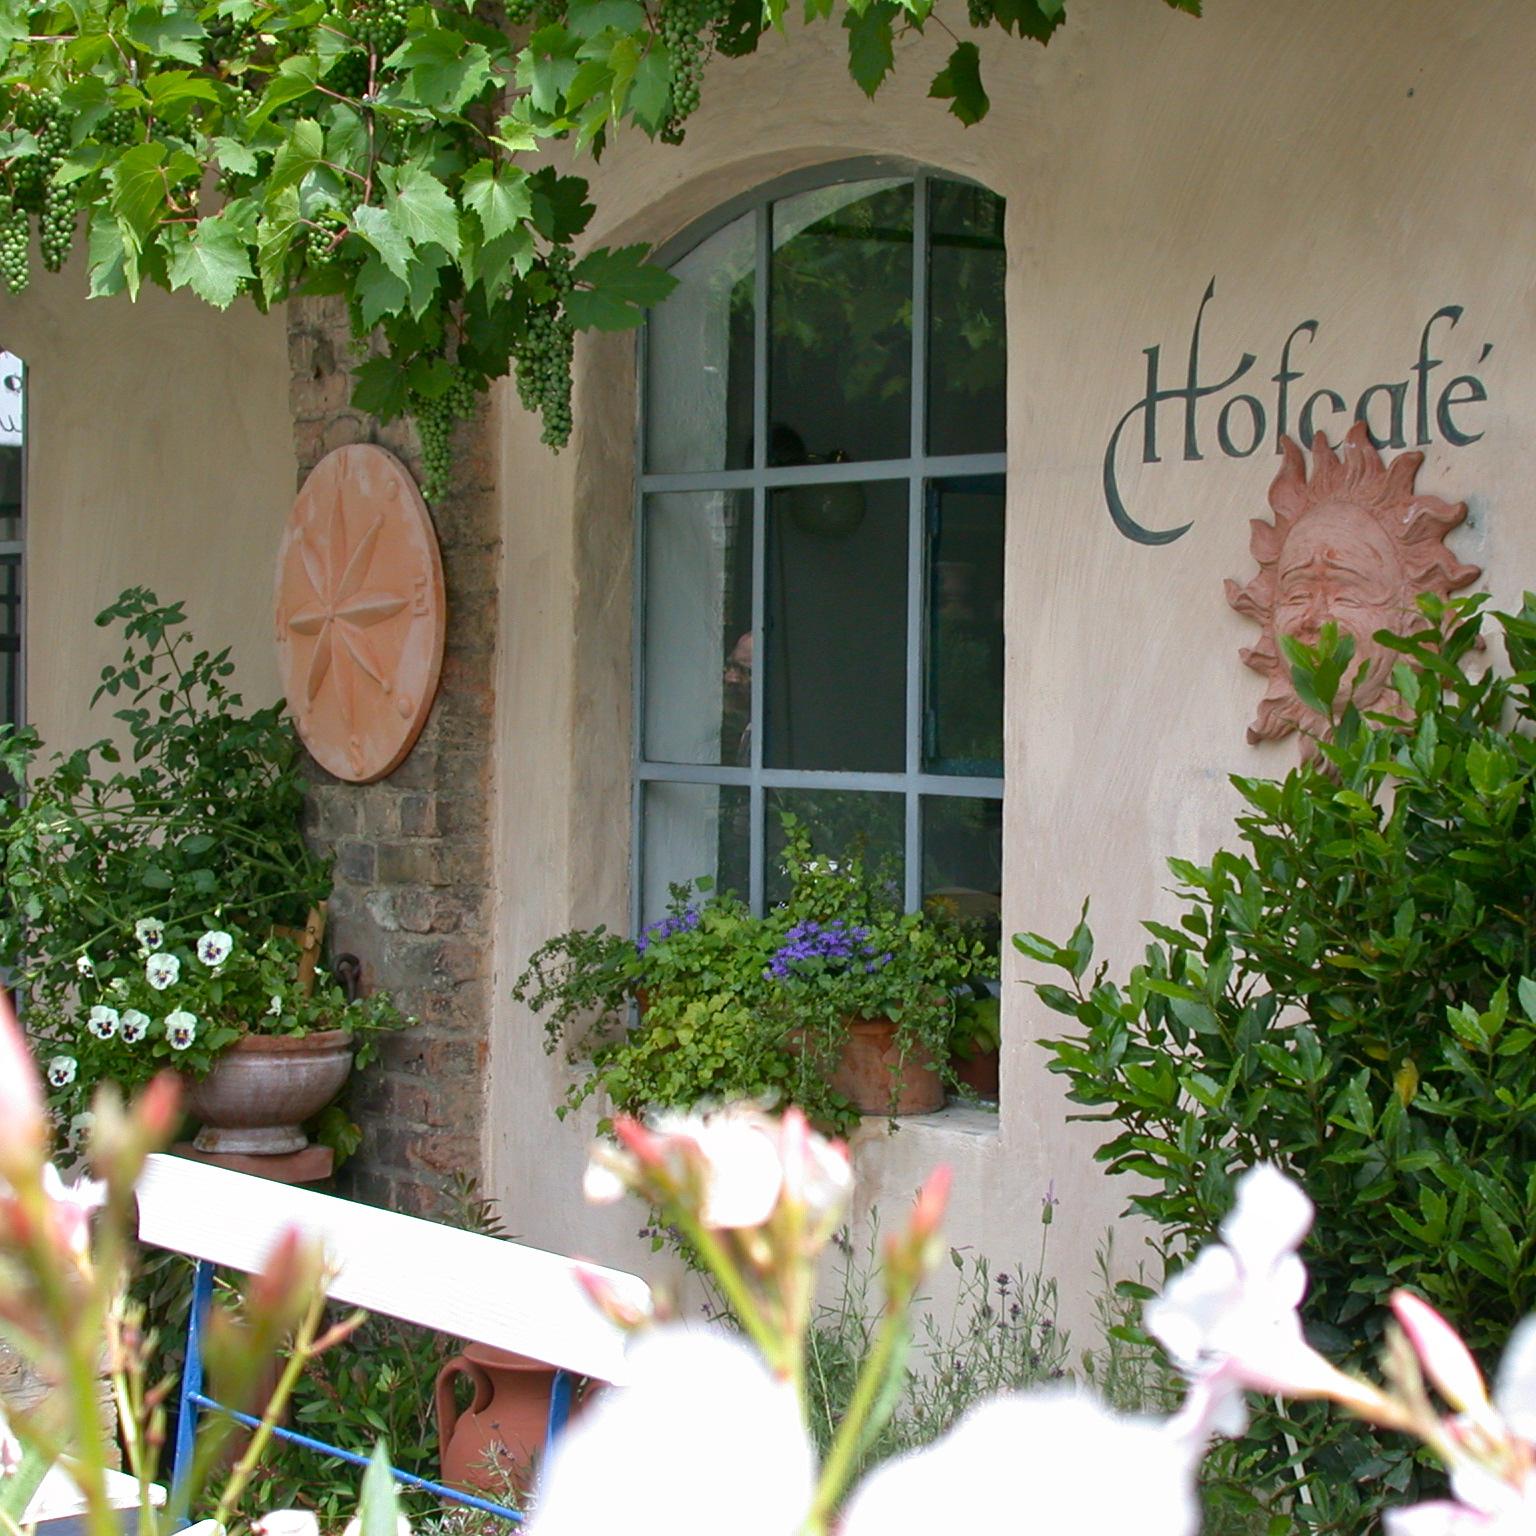 Hofcafe-Mutter-Fourage-Berlin-Wannsee-Cafe